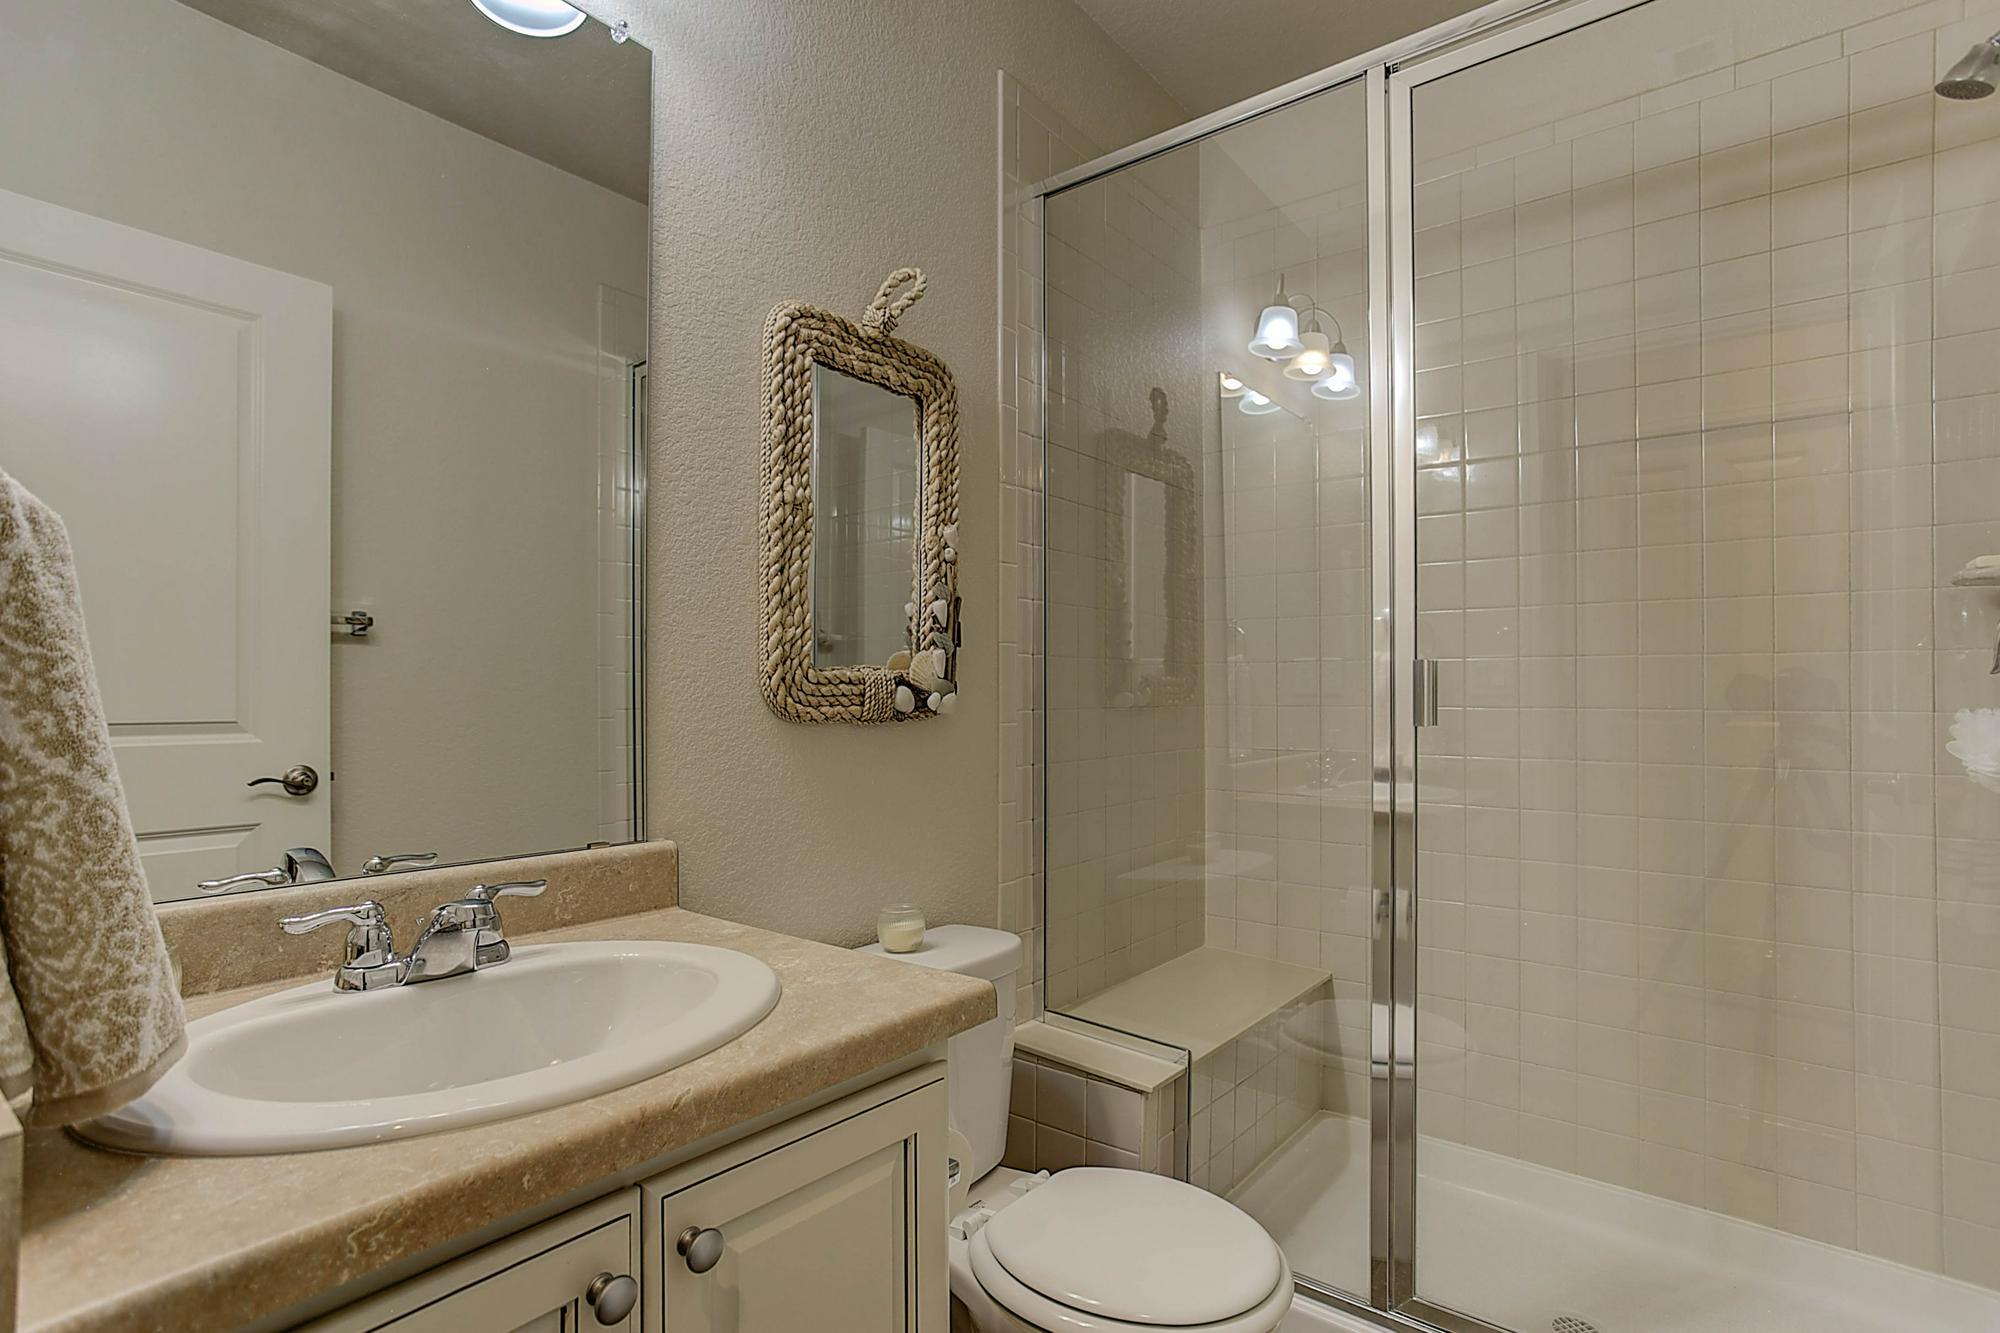 Listassistimage-338081-web_ready-22151%2beast%2beuclid%2bplace_bathroom3-2000x2000